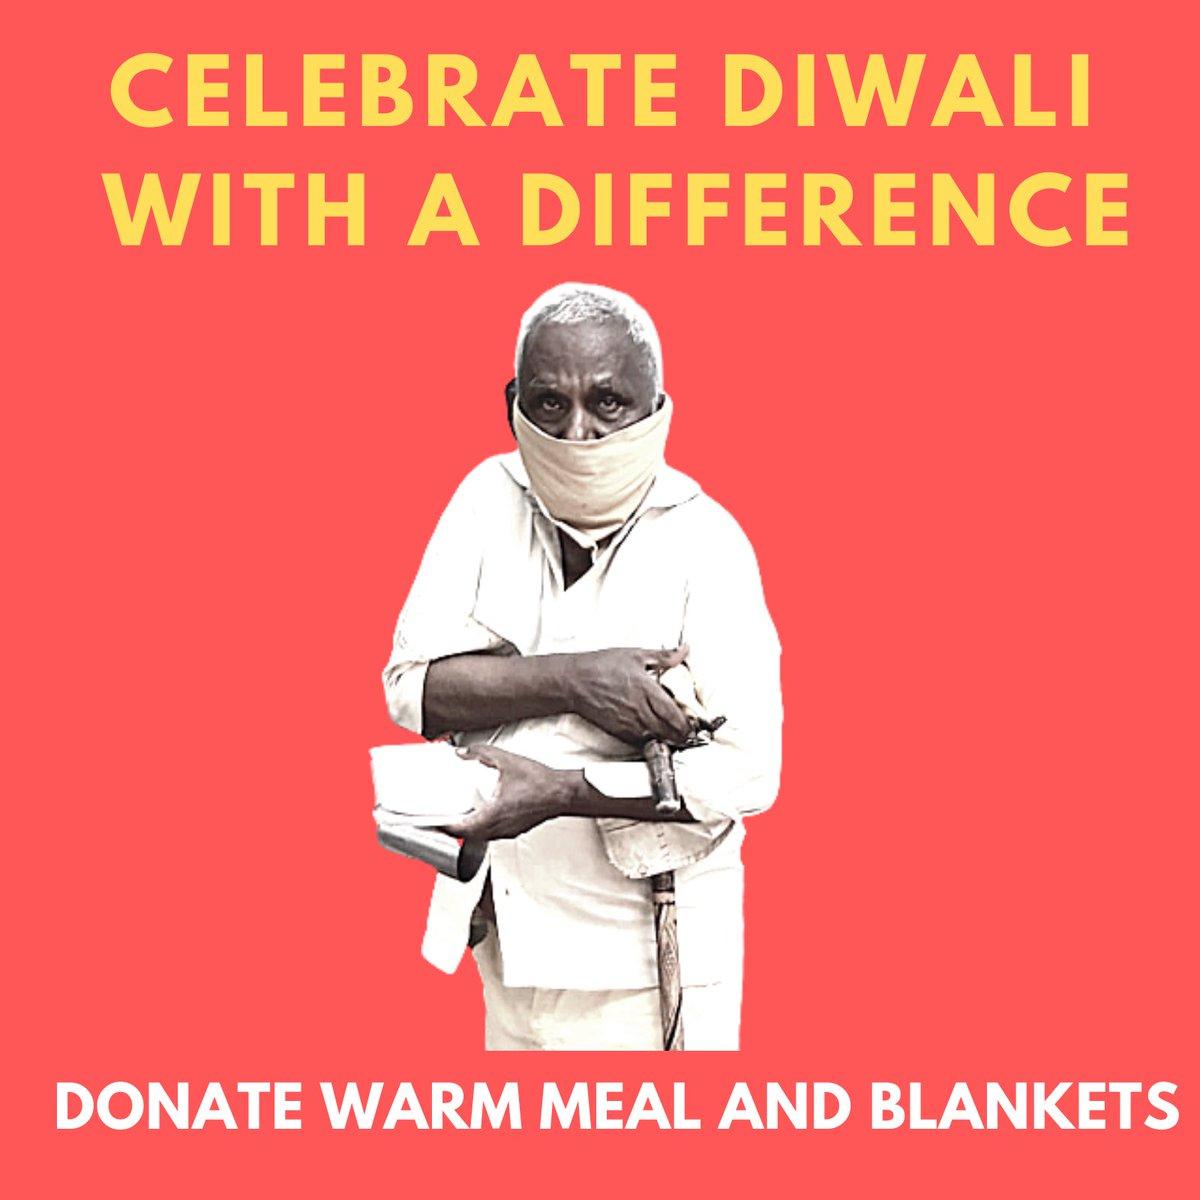 This Diwali, spread the light of happiness and hope to the homeless.   Donate a warm meal and blankets.   Link    Pls do share & rt @virendersehwag @BajpayeeManoj @KapilSharmaK9 @hvgoenka @suhasinih @Smita_Sharma @ARanganathan72 @rajeshkalra @cricketaakash